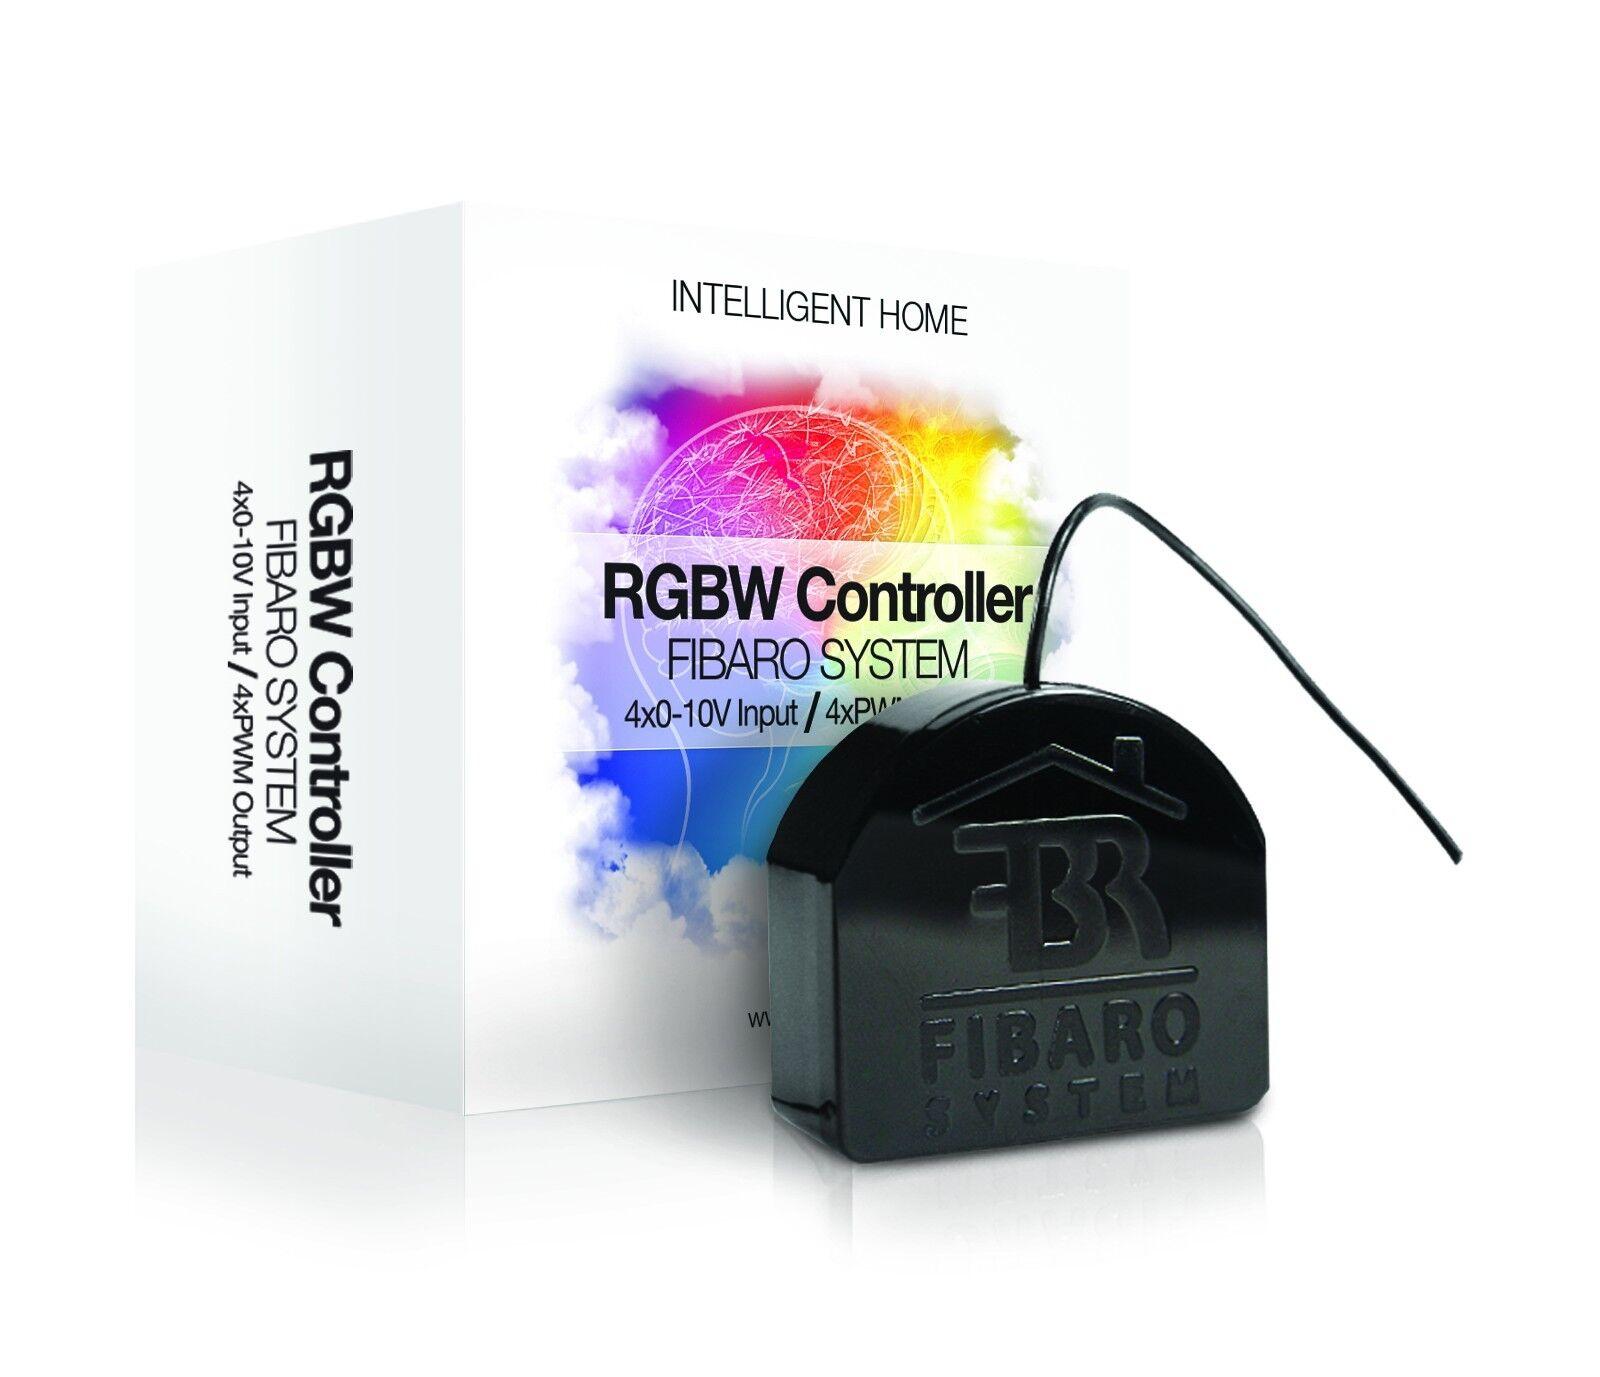 Fibaro Z-Wave RGBW Controller FGRGBWN-441 US